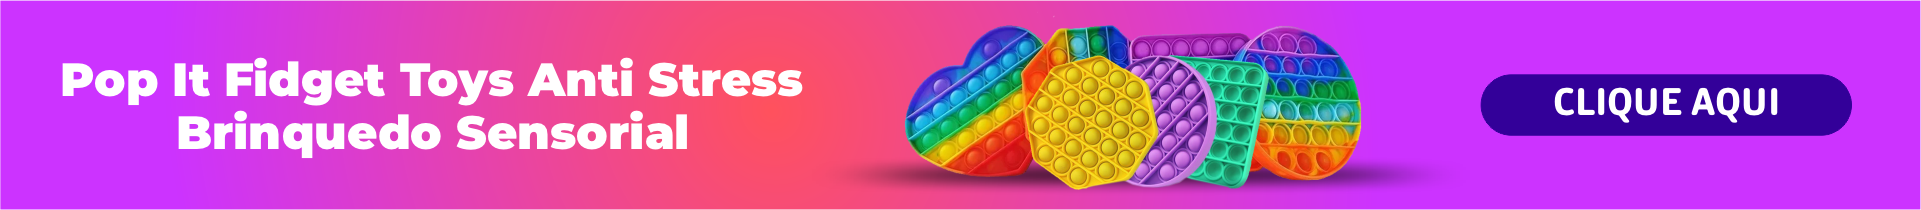 Pop It Fidget Toys Anti Stress Poc Pop Brinquedo Sensorial